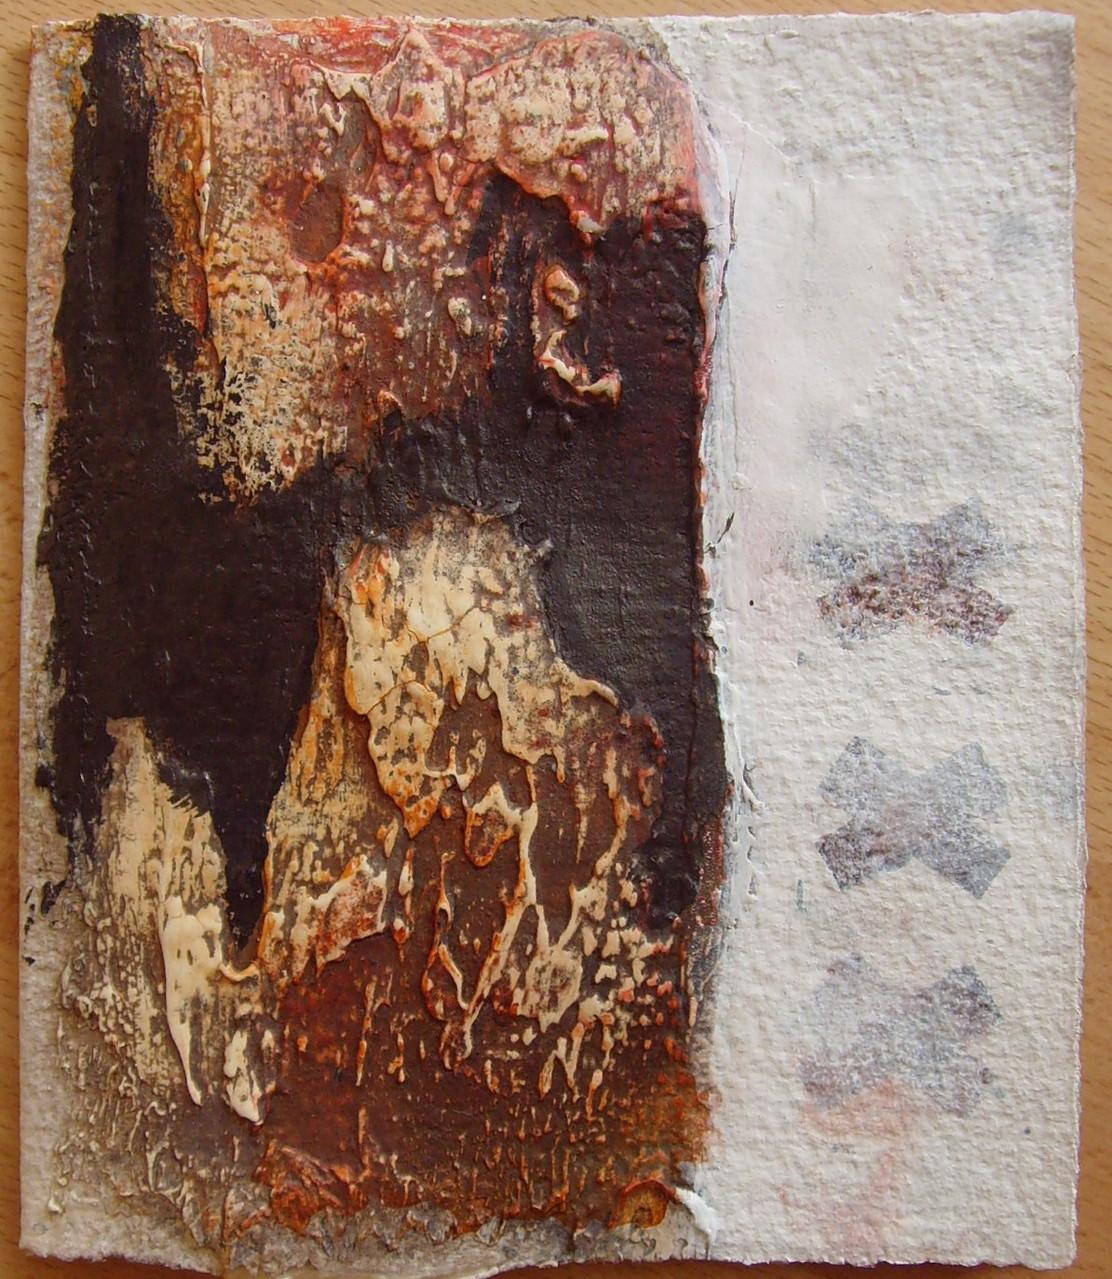 13,5 x 16cm, Klappkarte, Materialmix